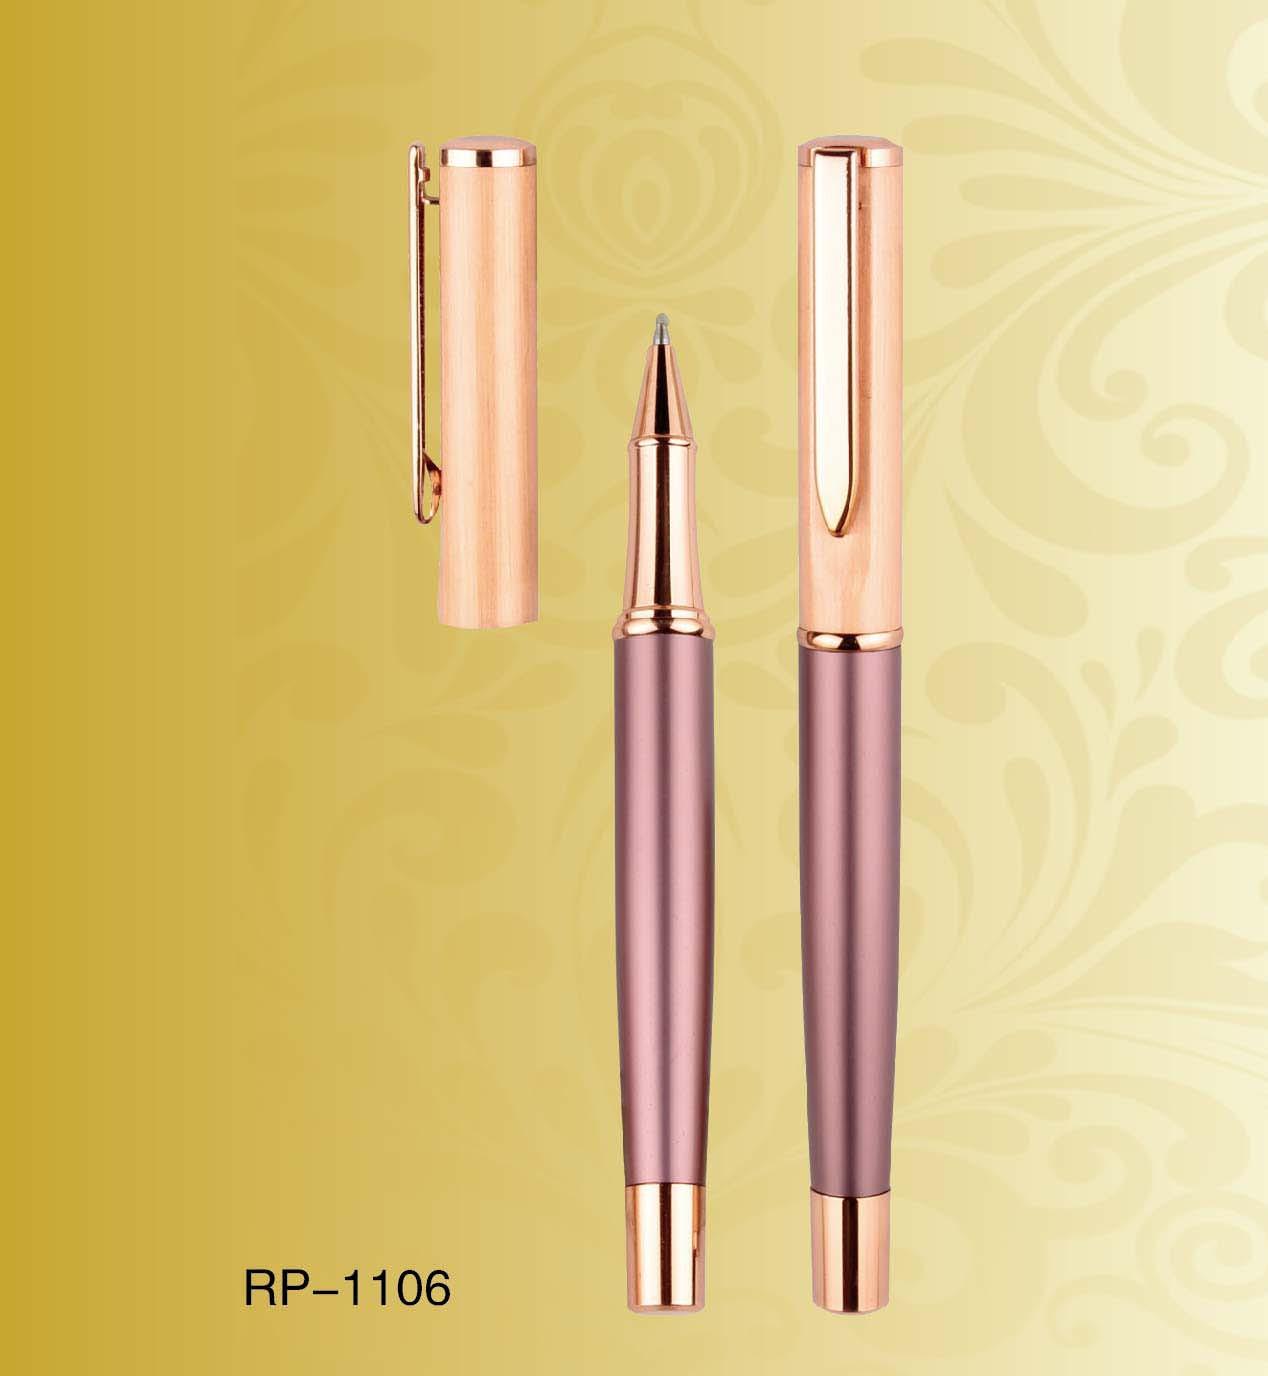 RP-1106